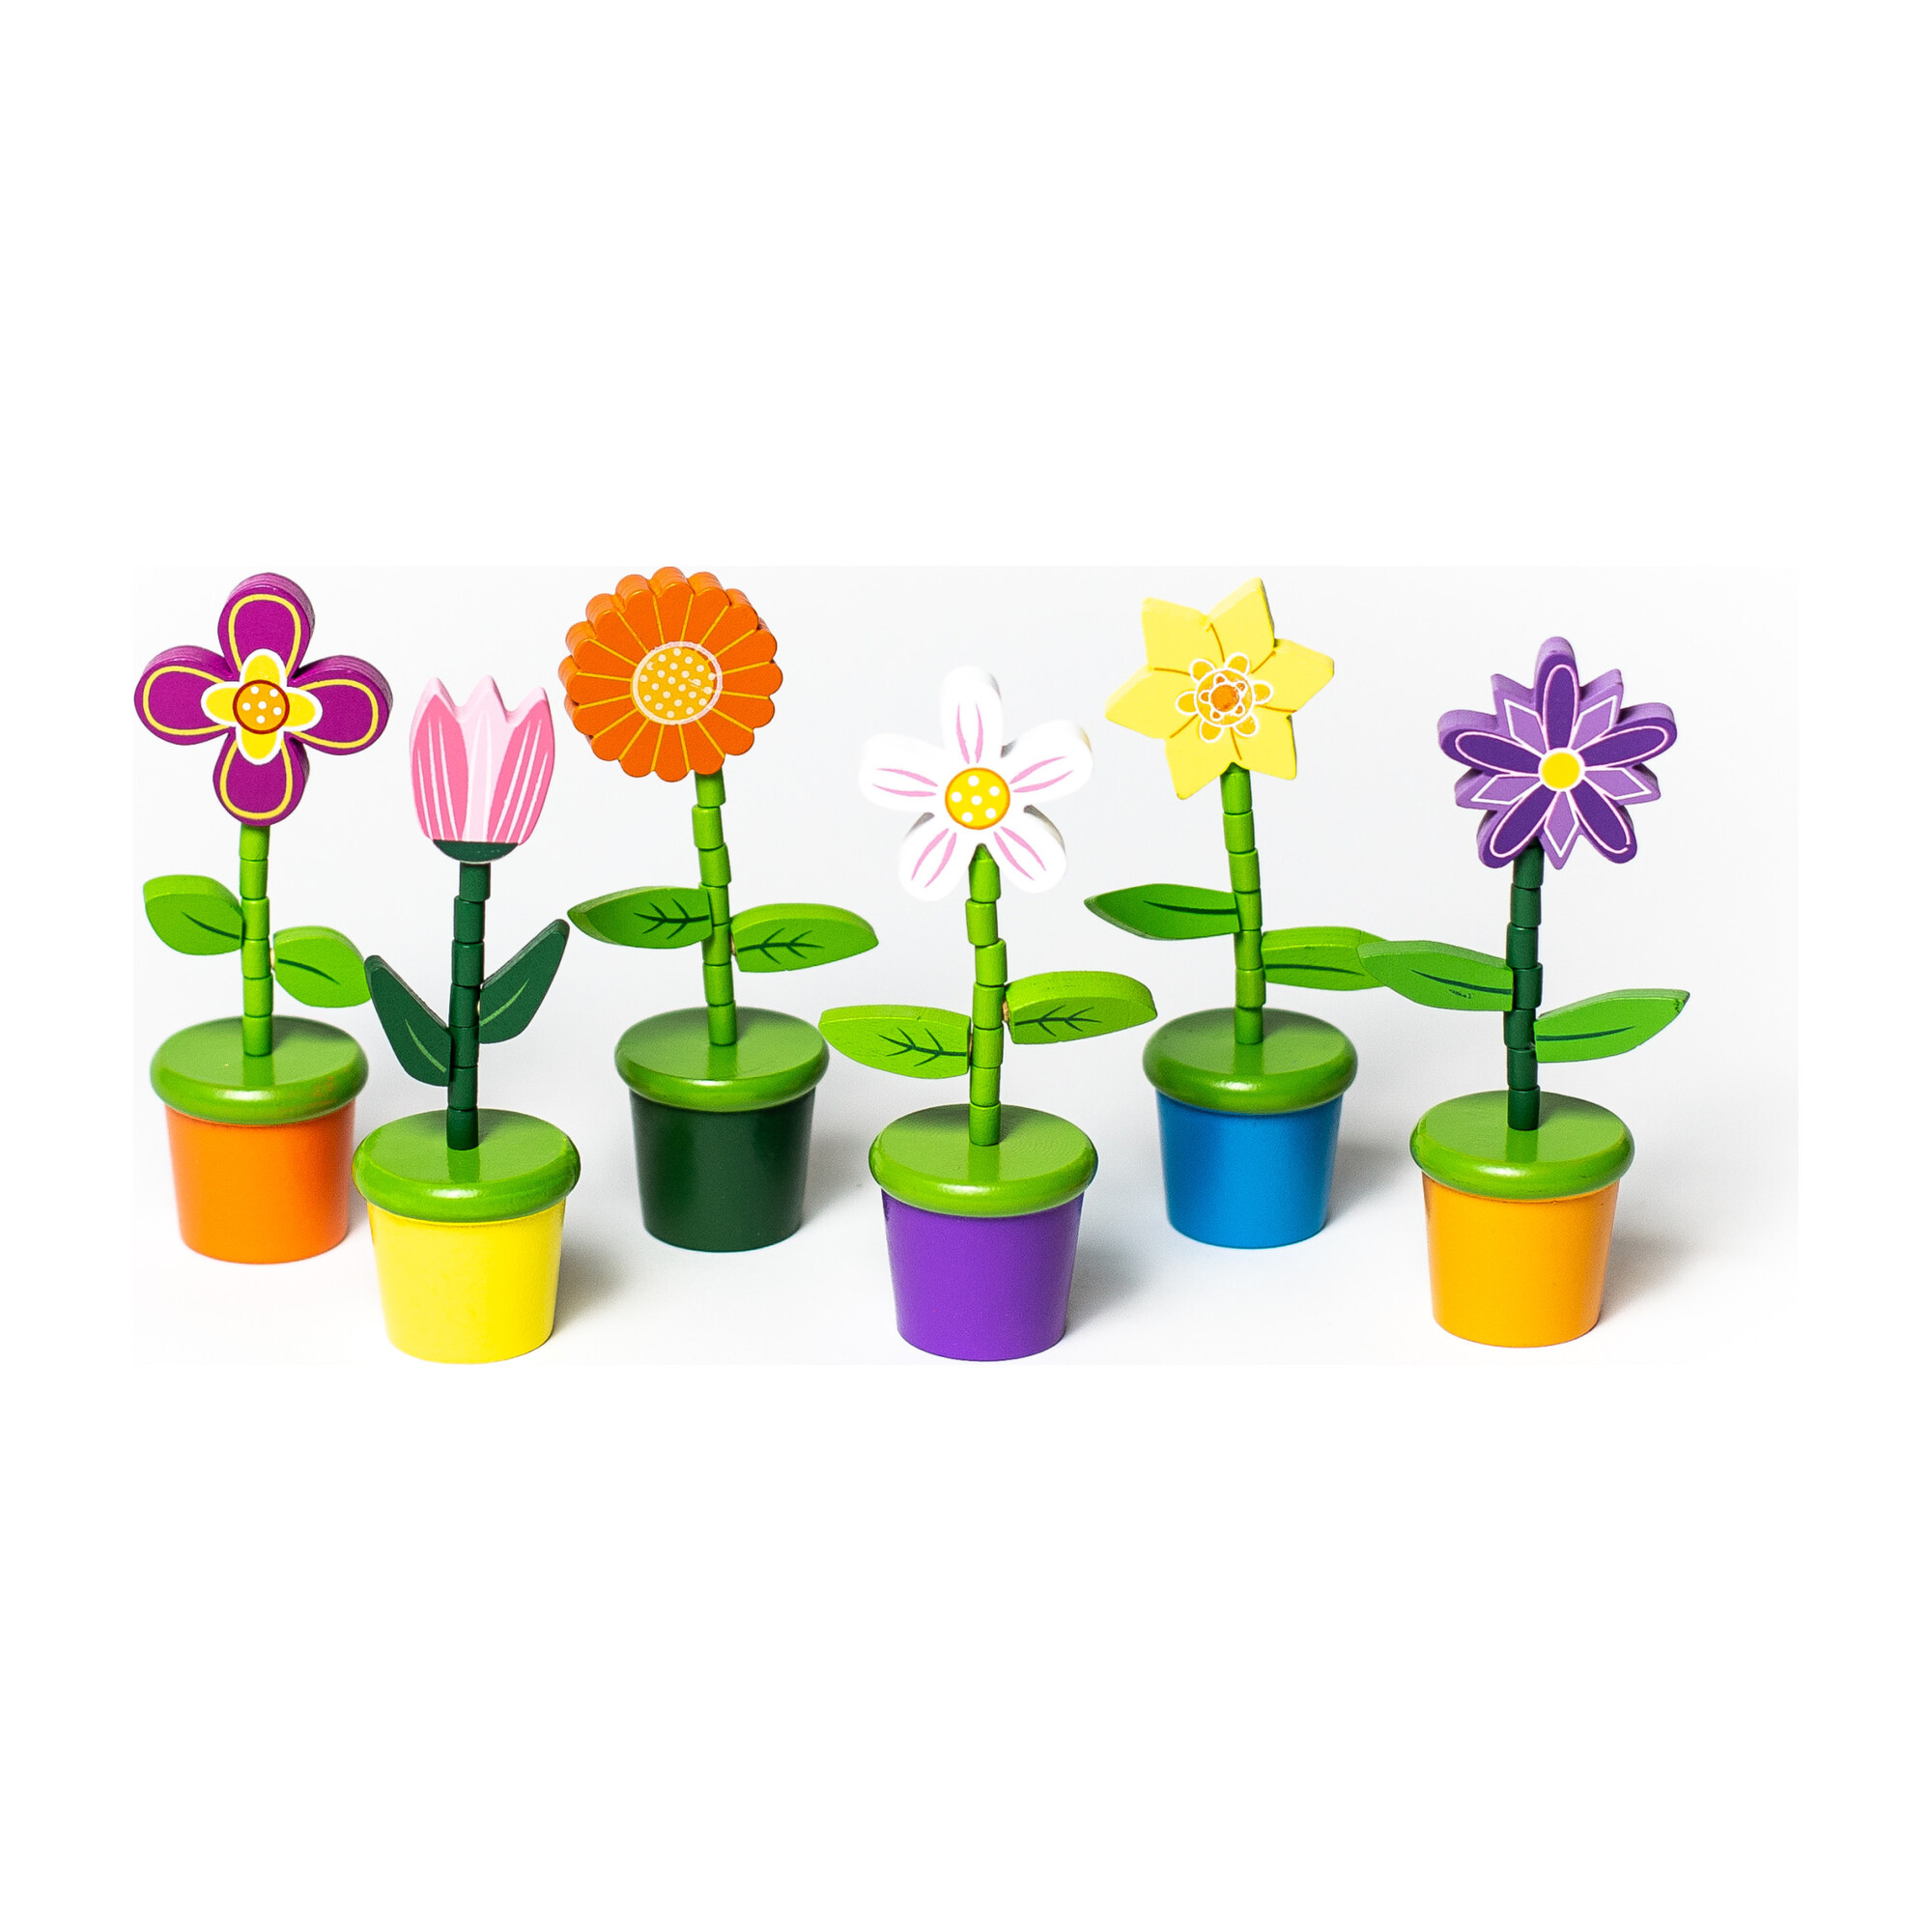 Flower Push Puppets, Set of 6